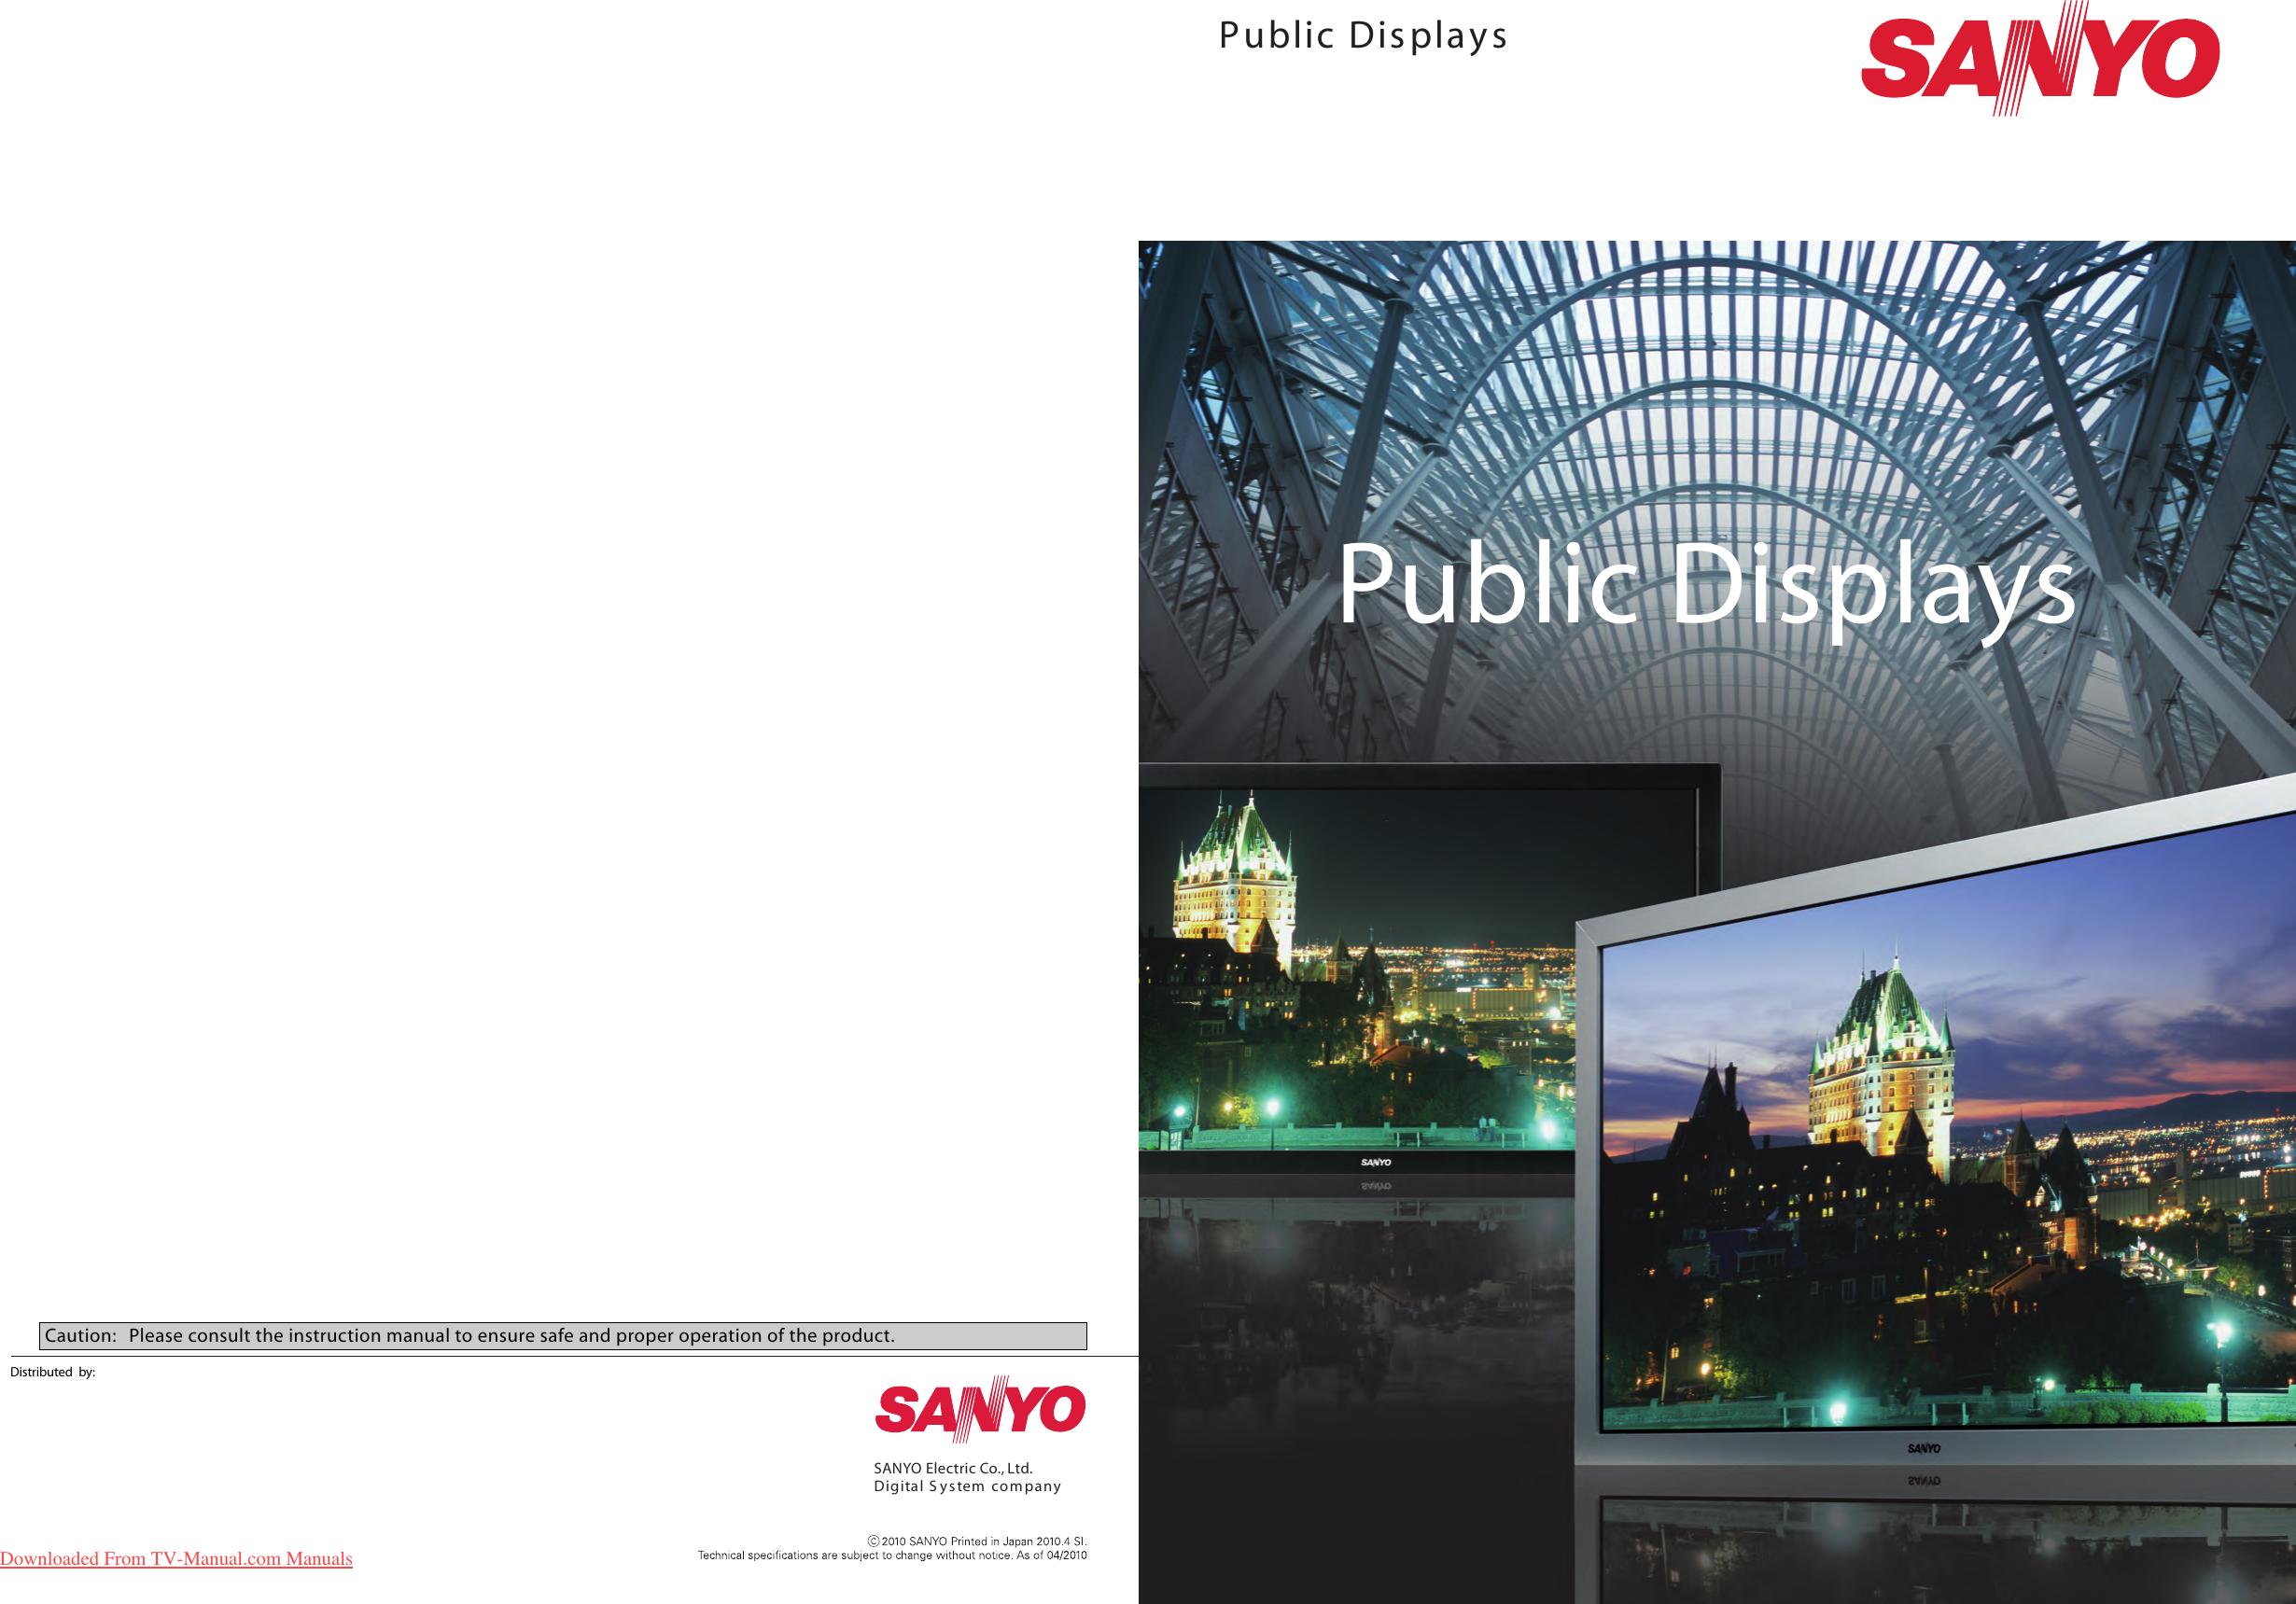 Sanyo 52SR3 42SR4 User Manual Tv Guide Operating